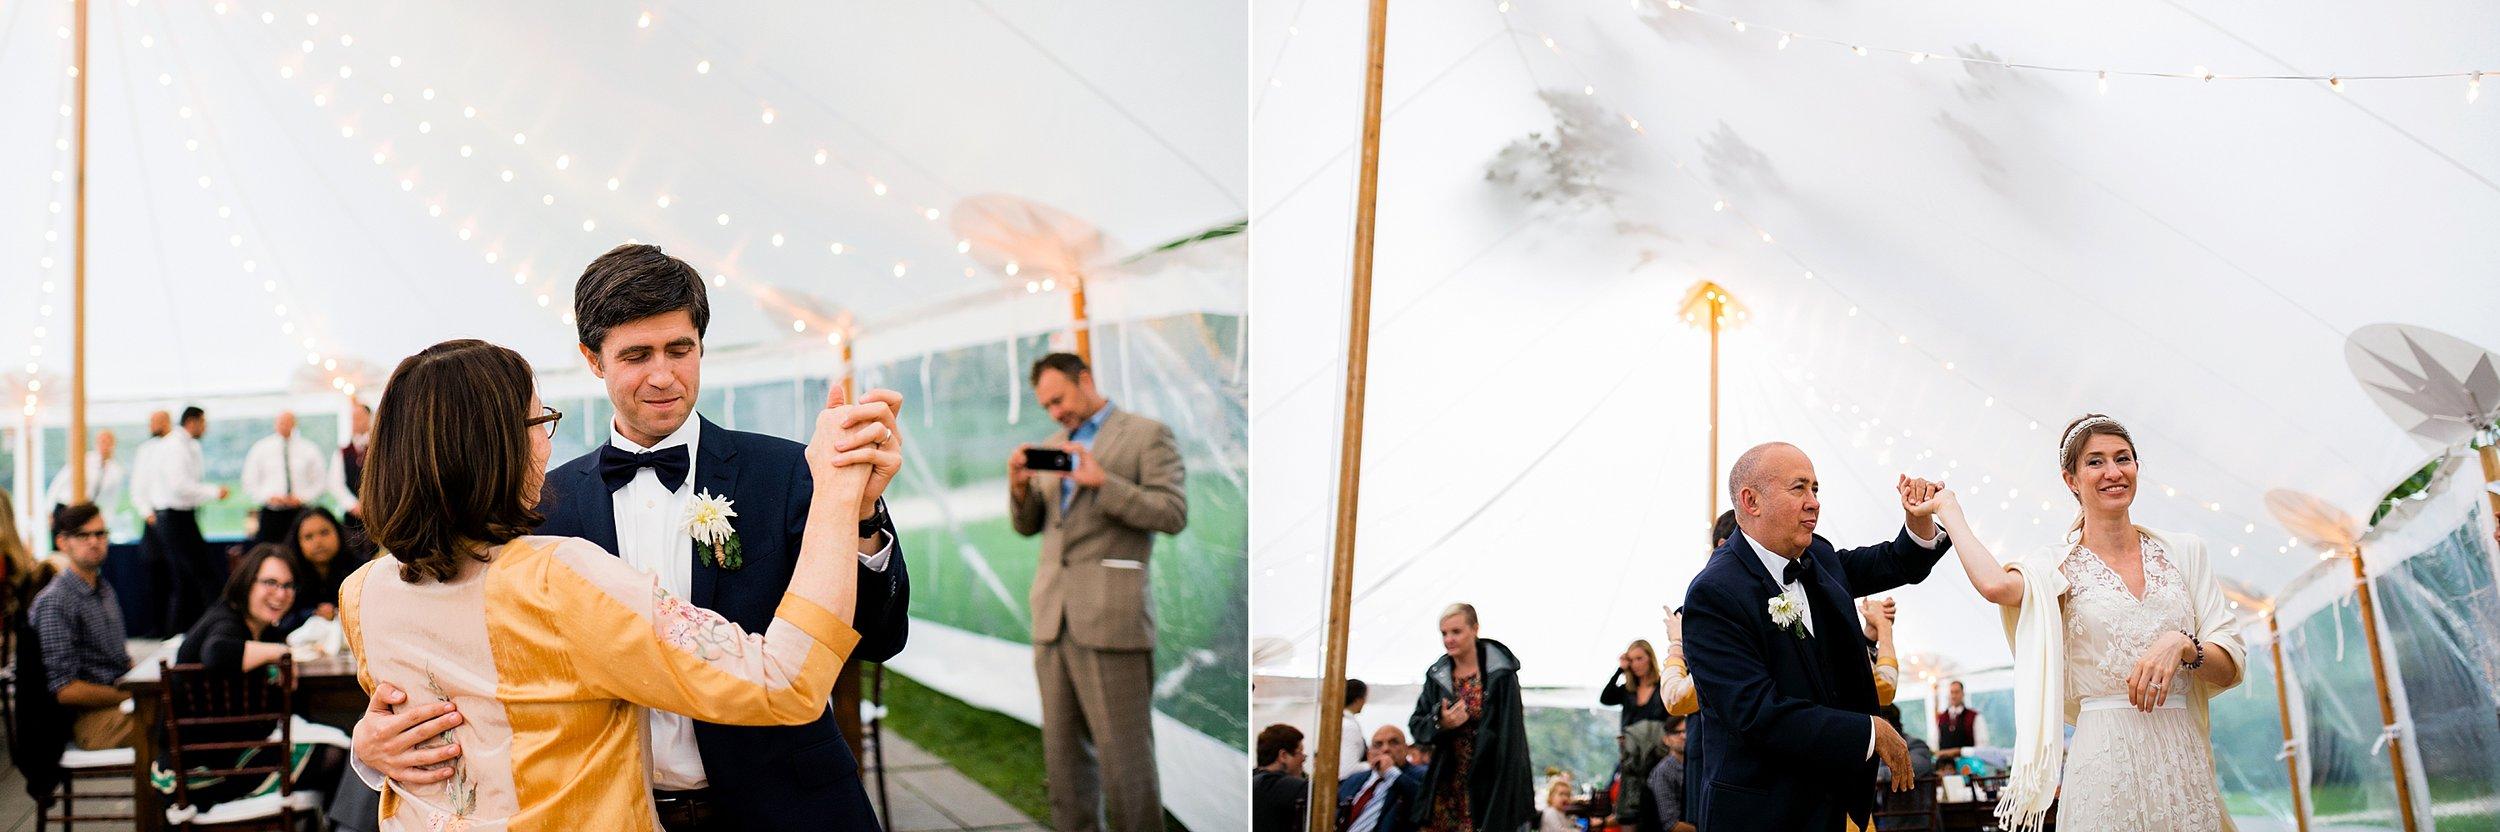 051 marthas vineyard wedding photographer todd danforth photography.jpg